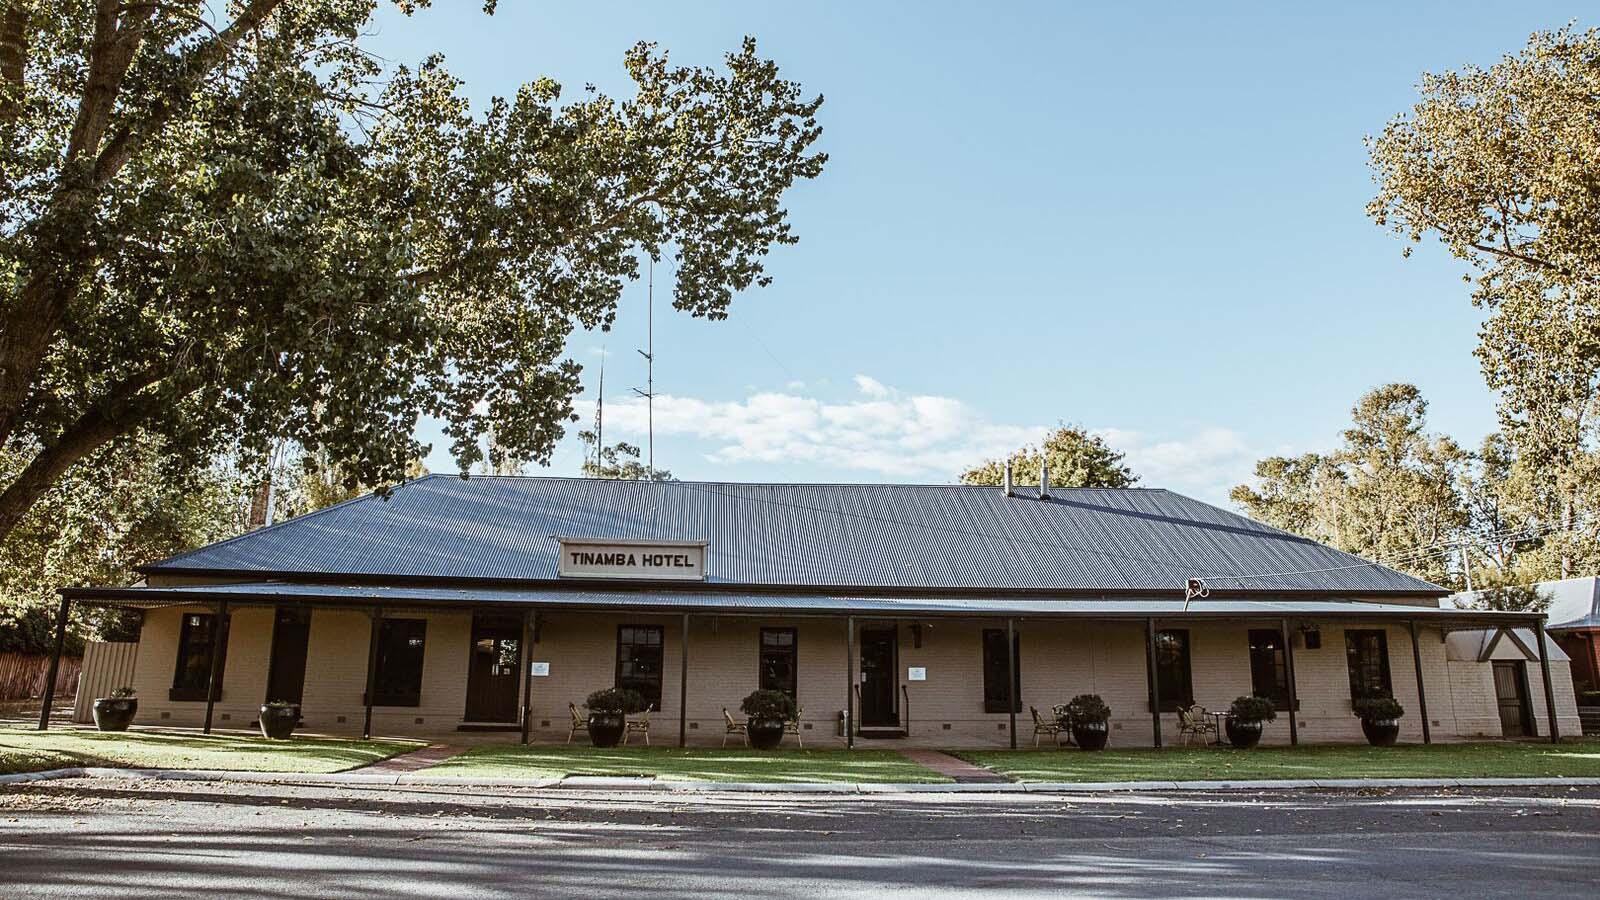 Tinamba Hotel, Gippsland, Victoria, Australia